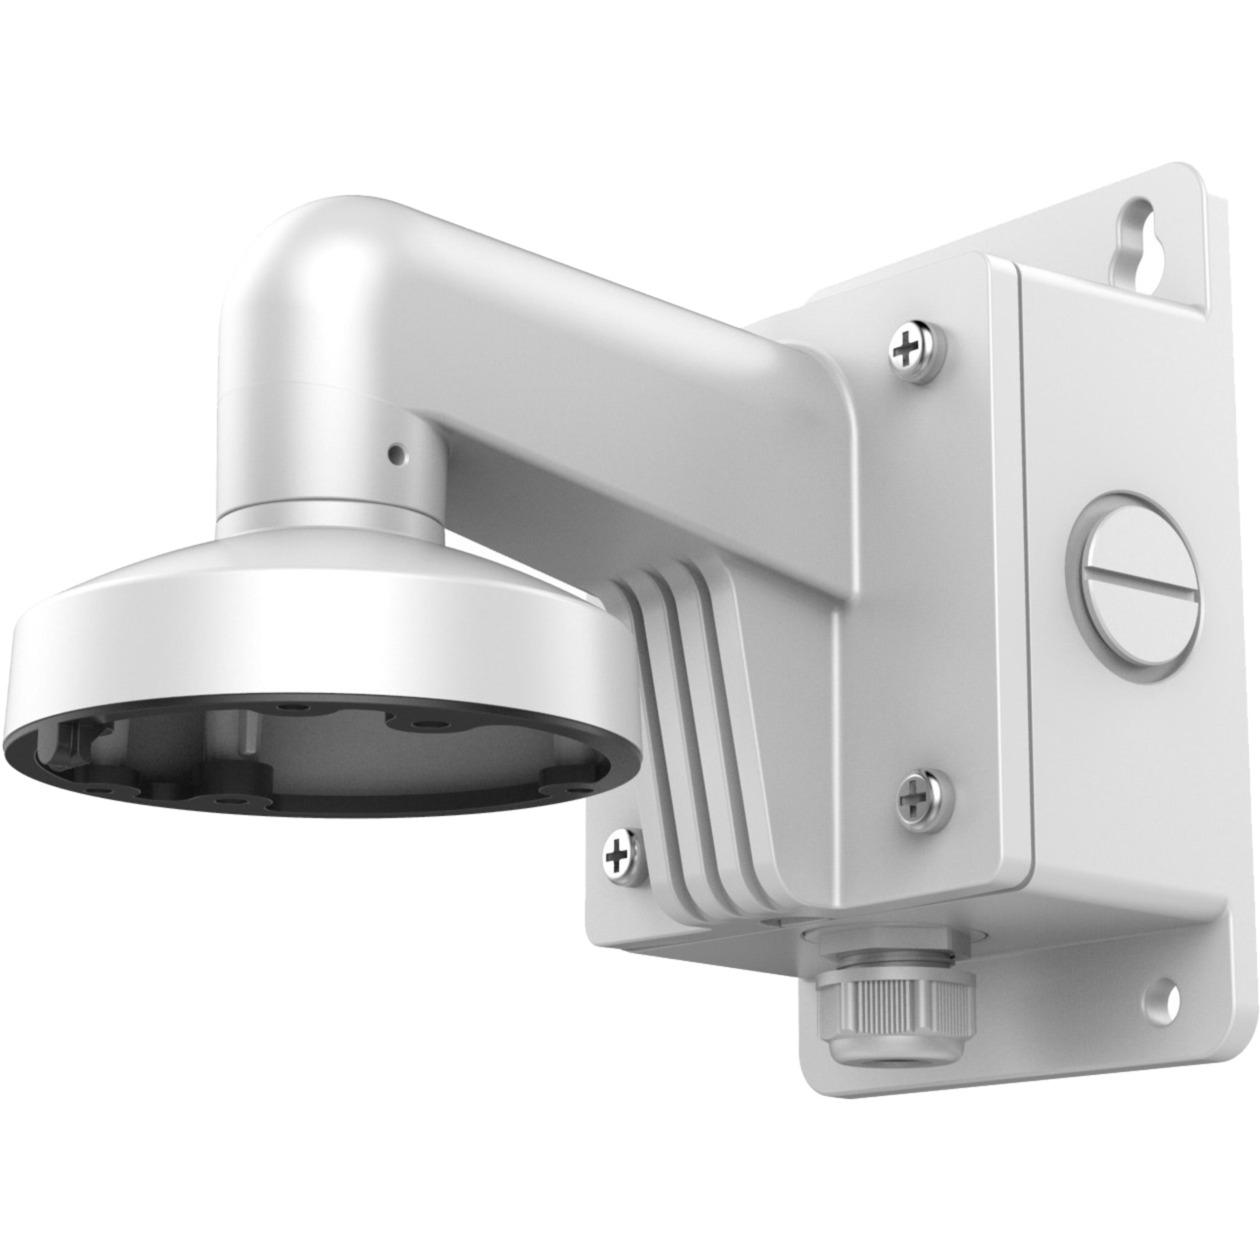 CAS-7302 Pie para cámara, Soporte de pared